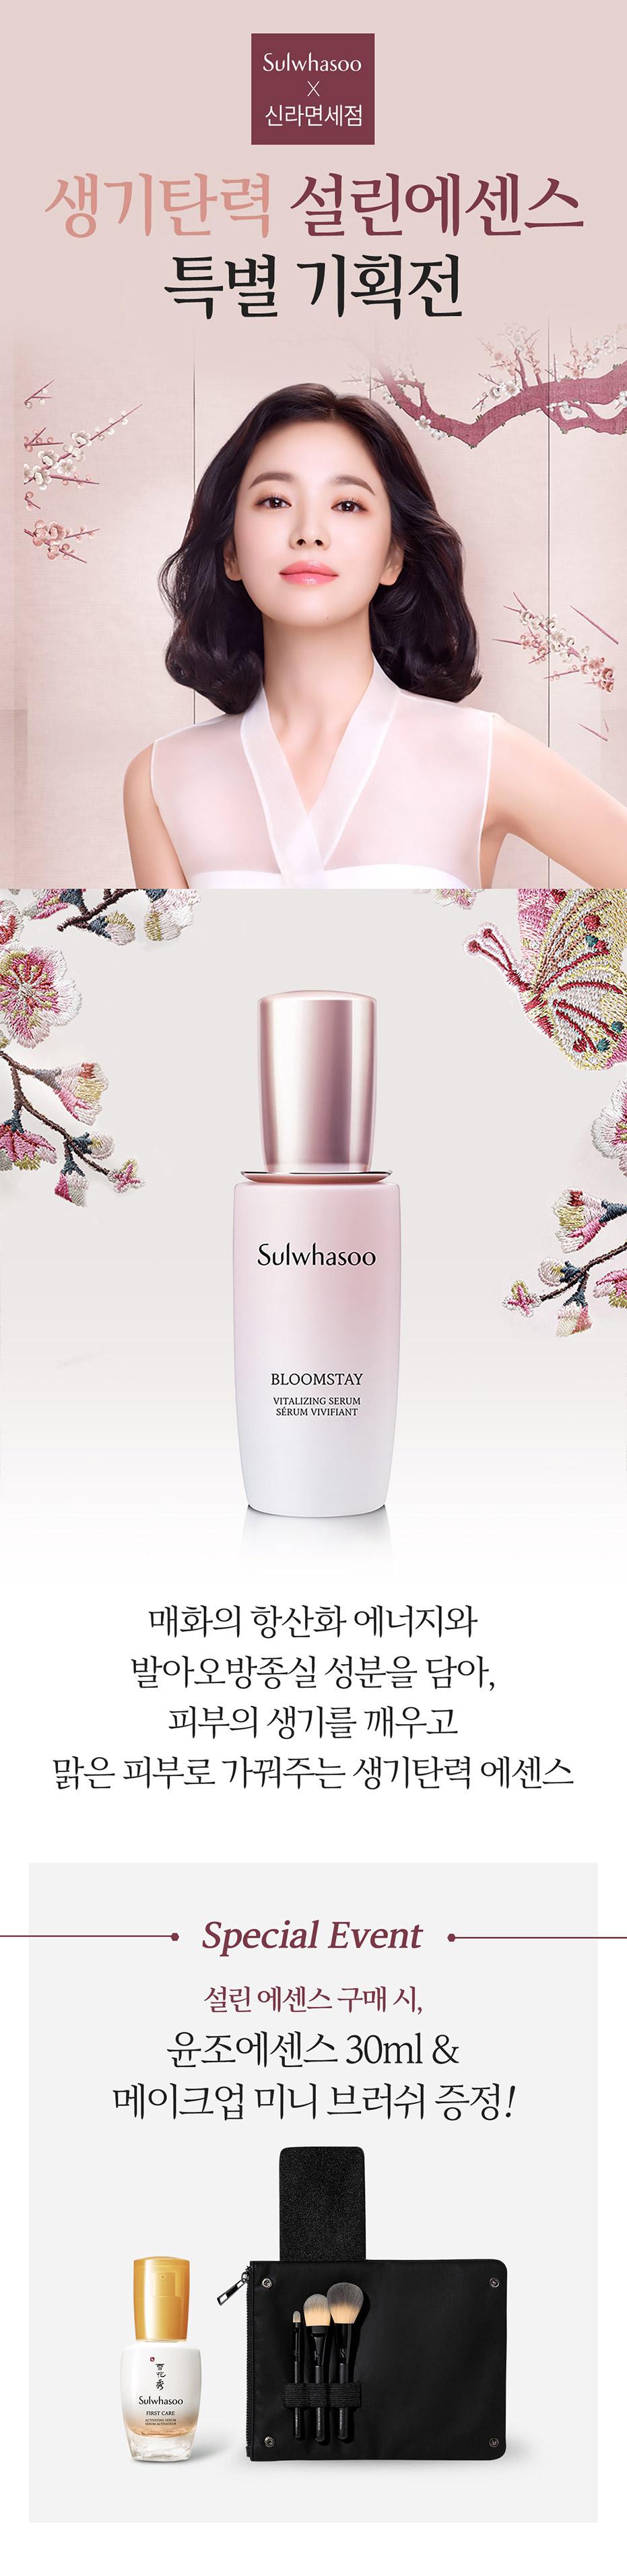 SULWAHSOO